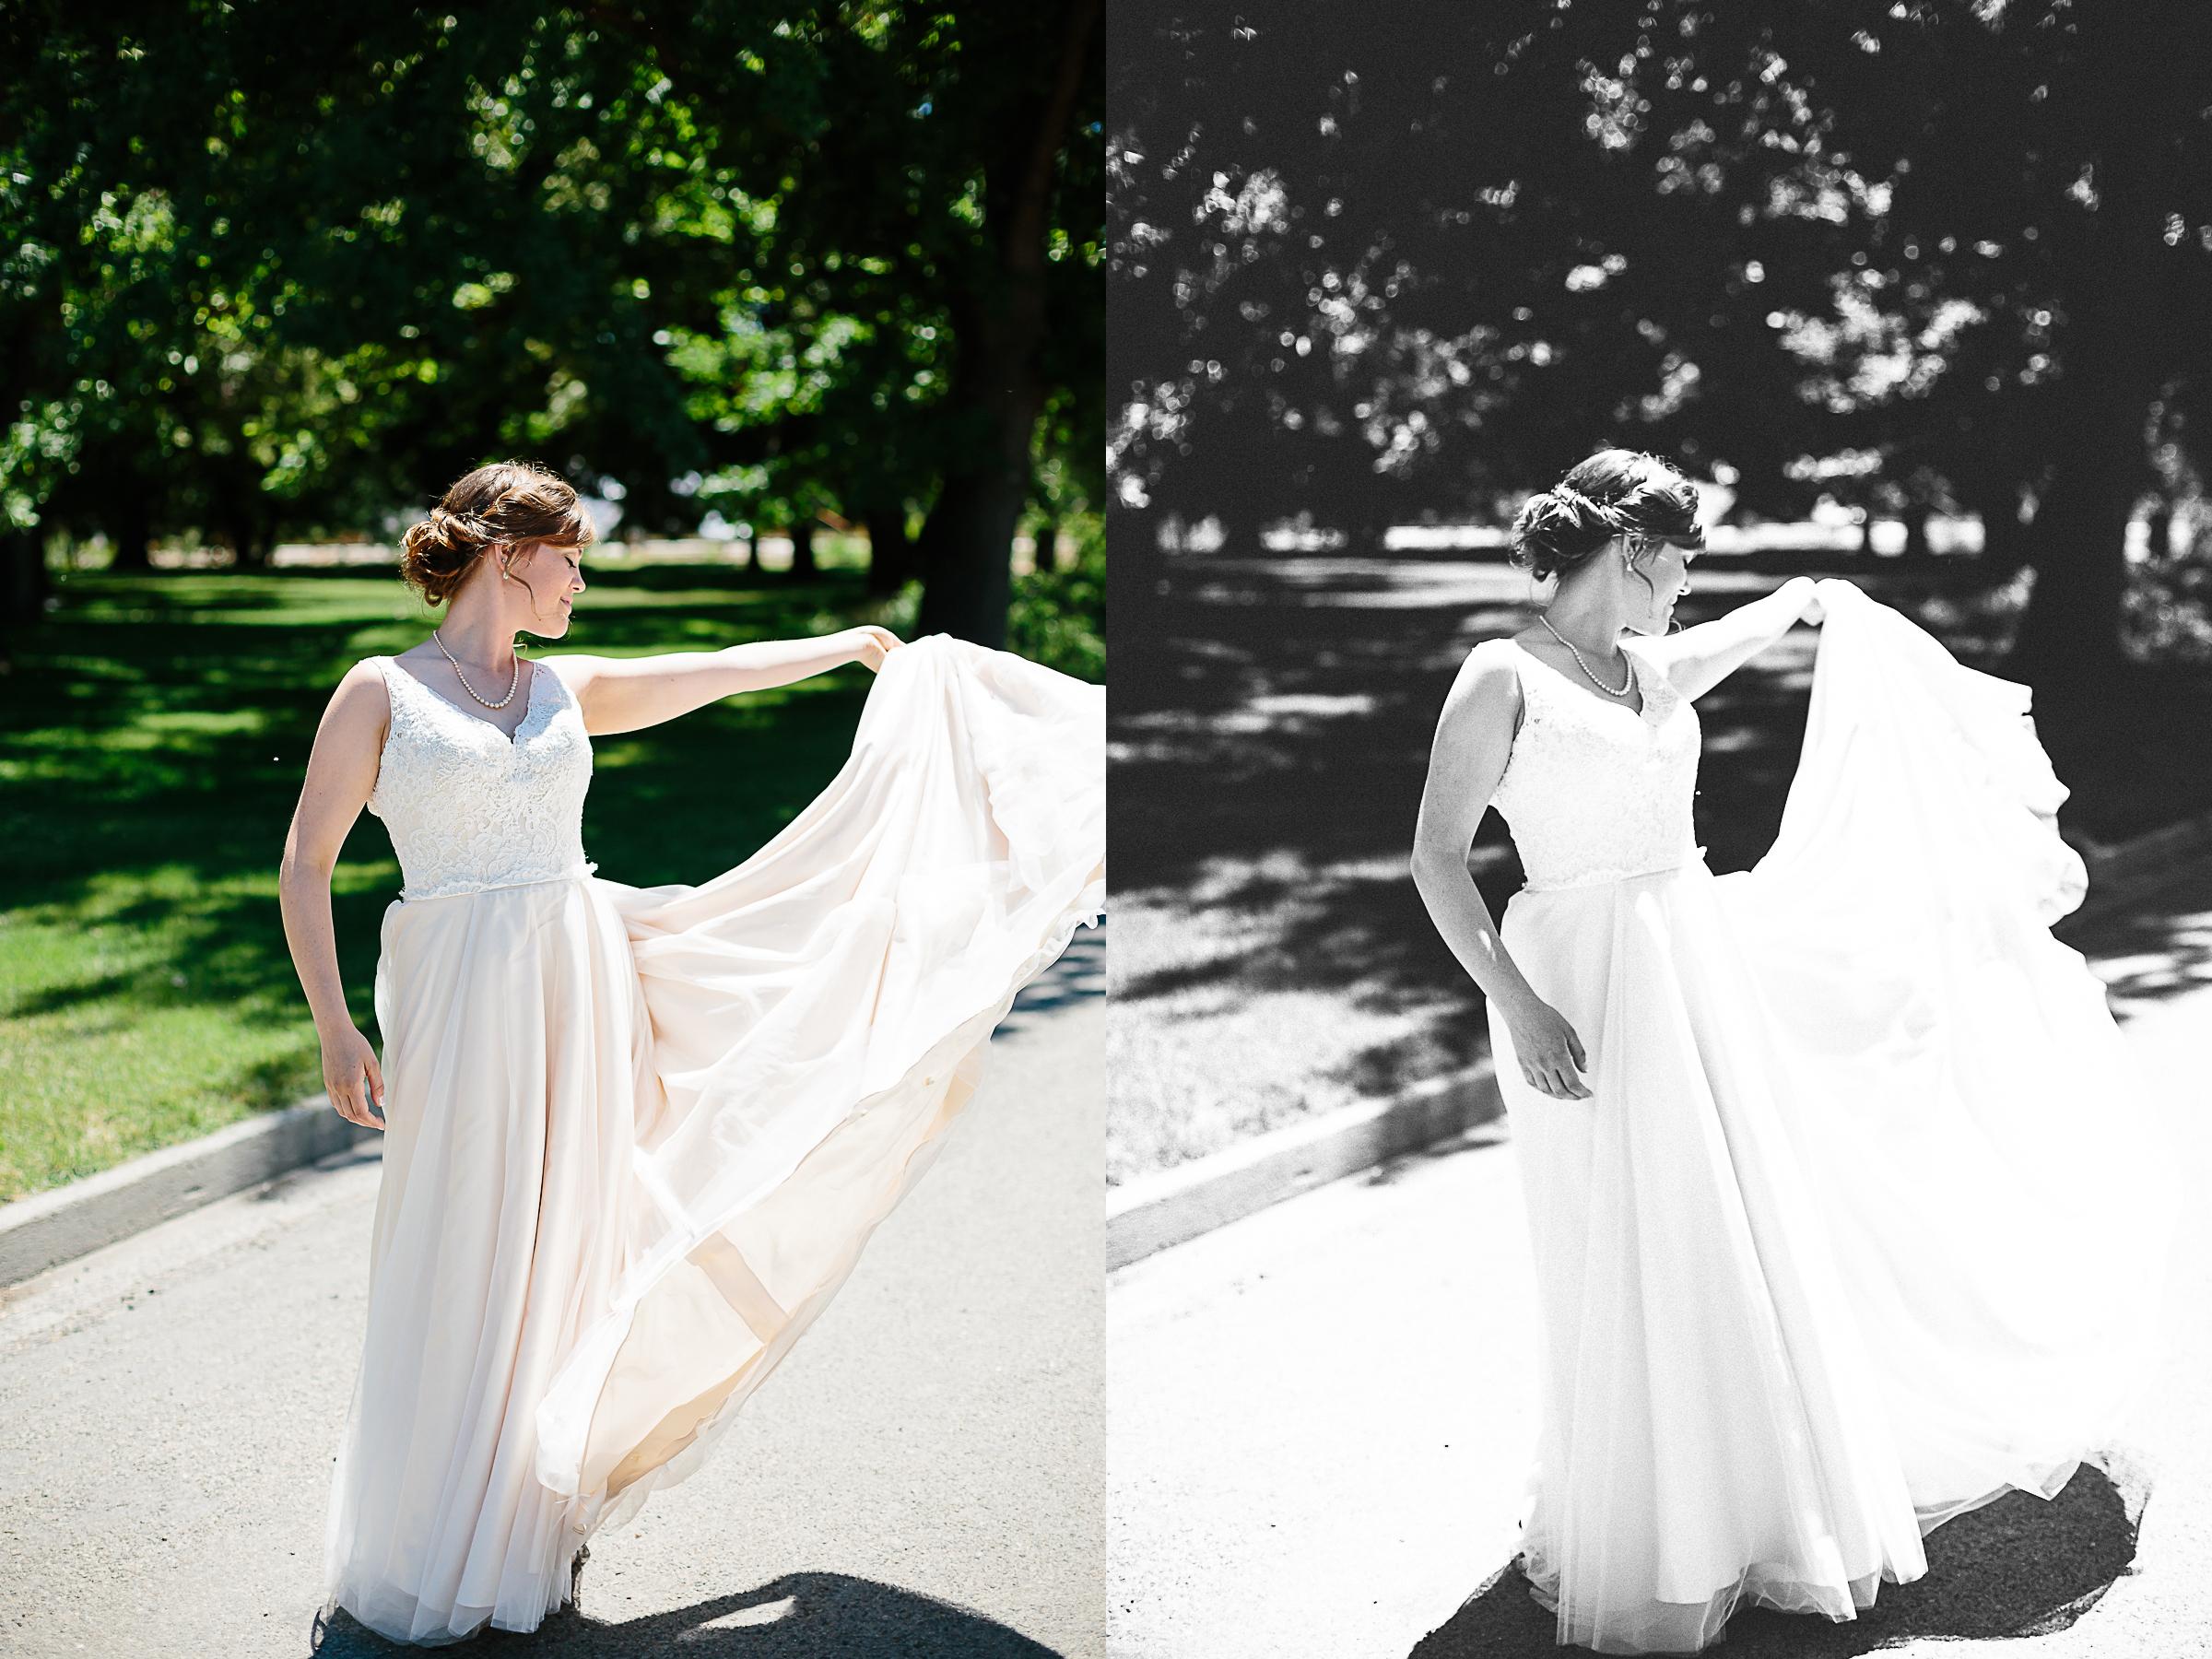 Shantel's Flowing Wedding Dress.jpg